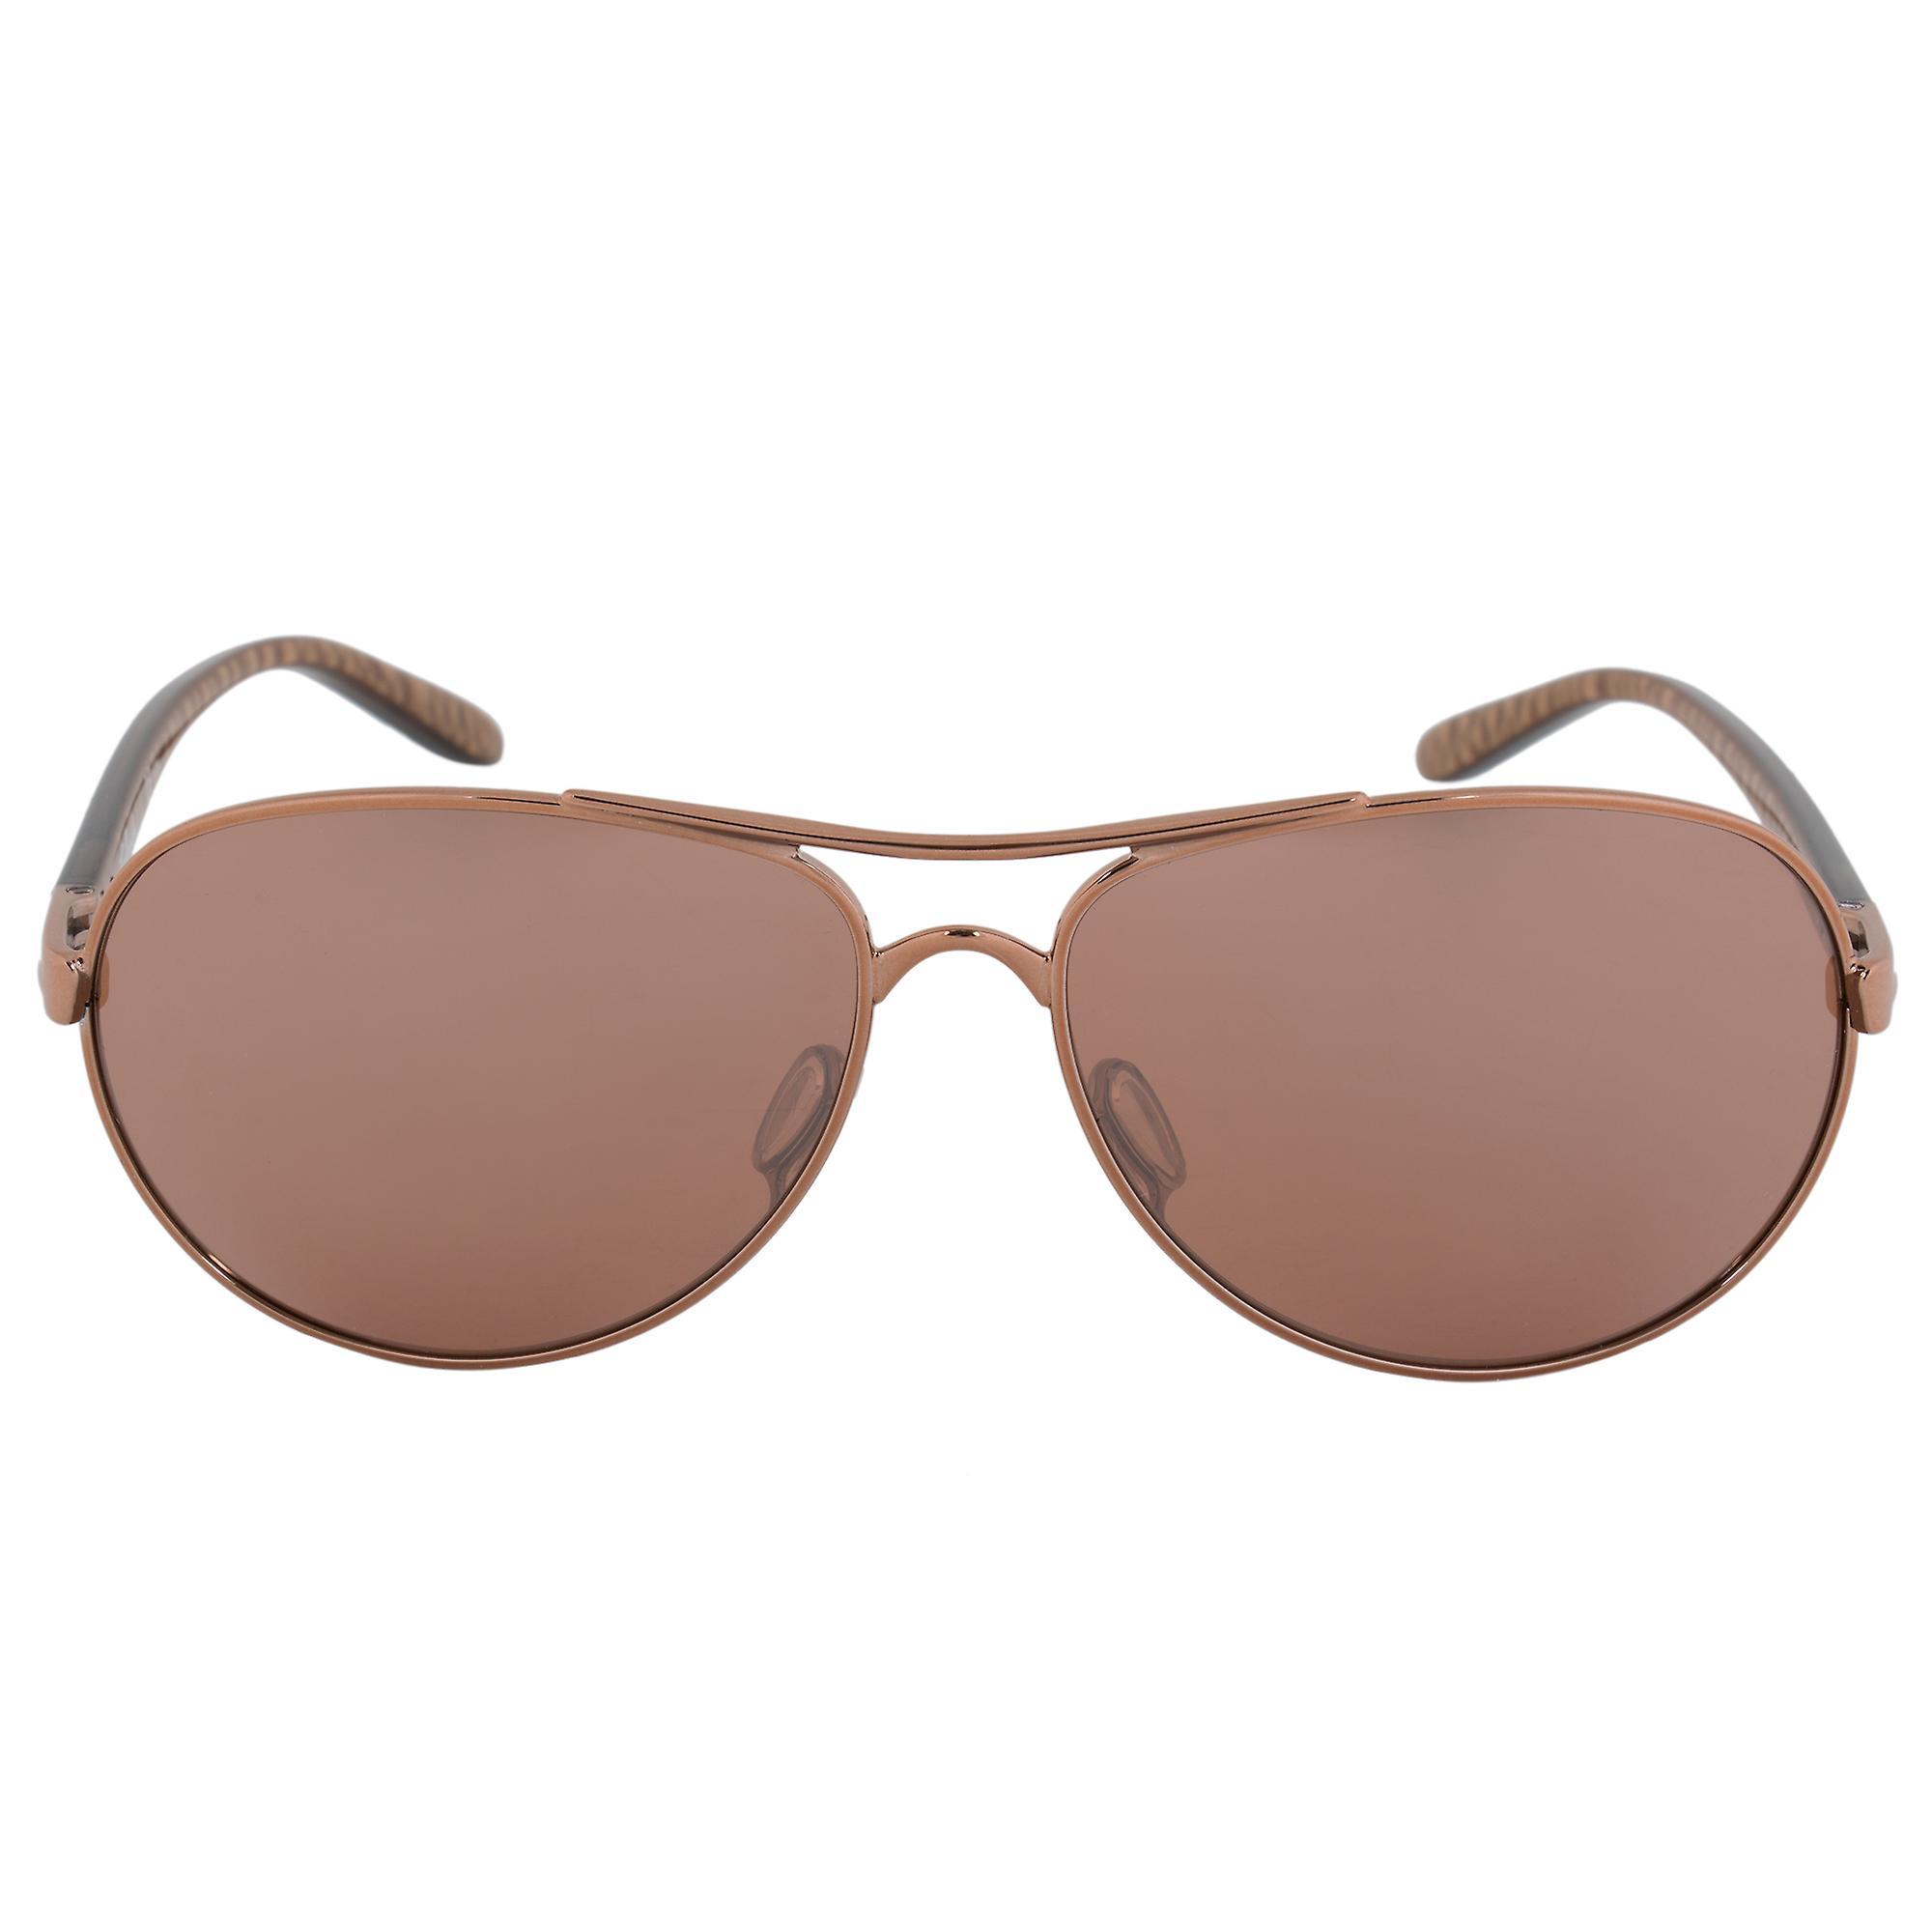 Oakley Feedback Pilot Sunglasses 0OO4079 407930 59 | Burned Copper Frame | Brown Gradient Lenses